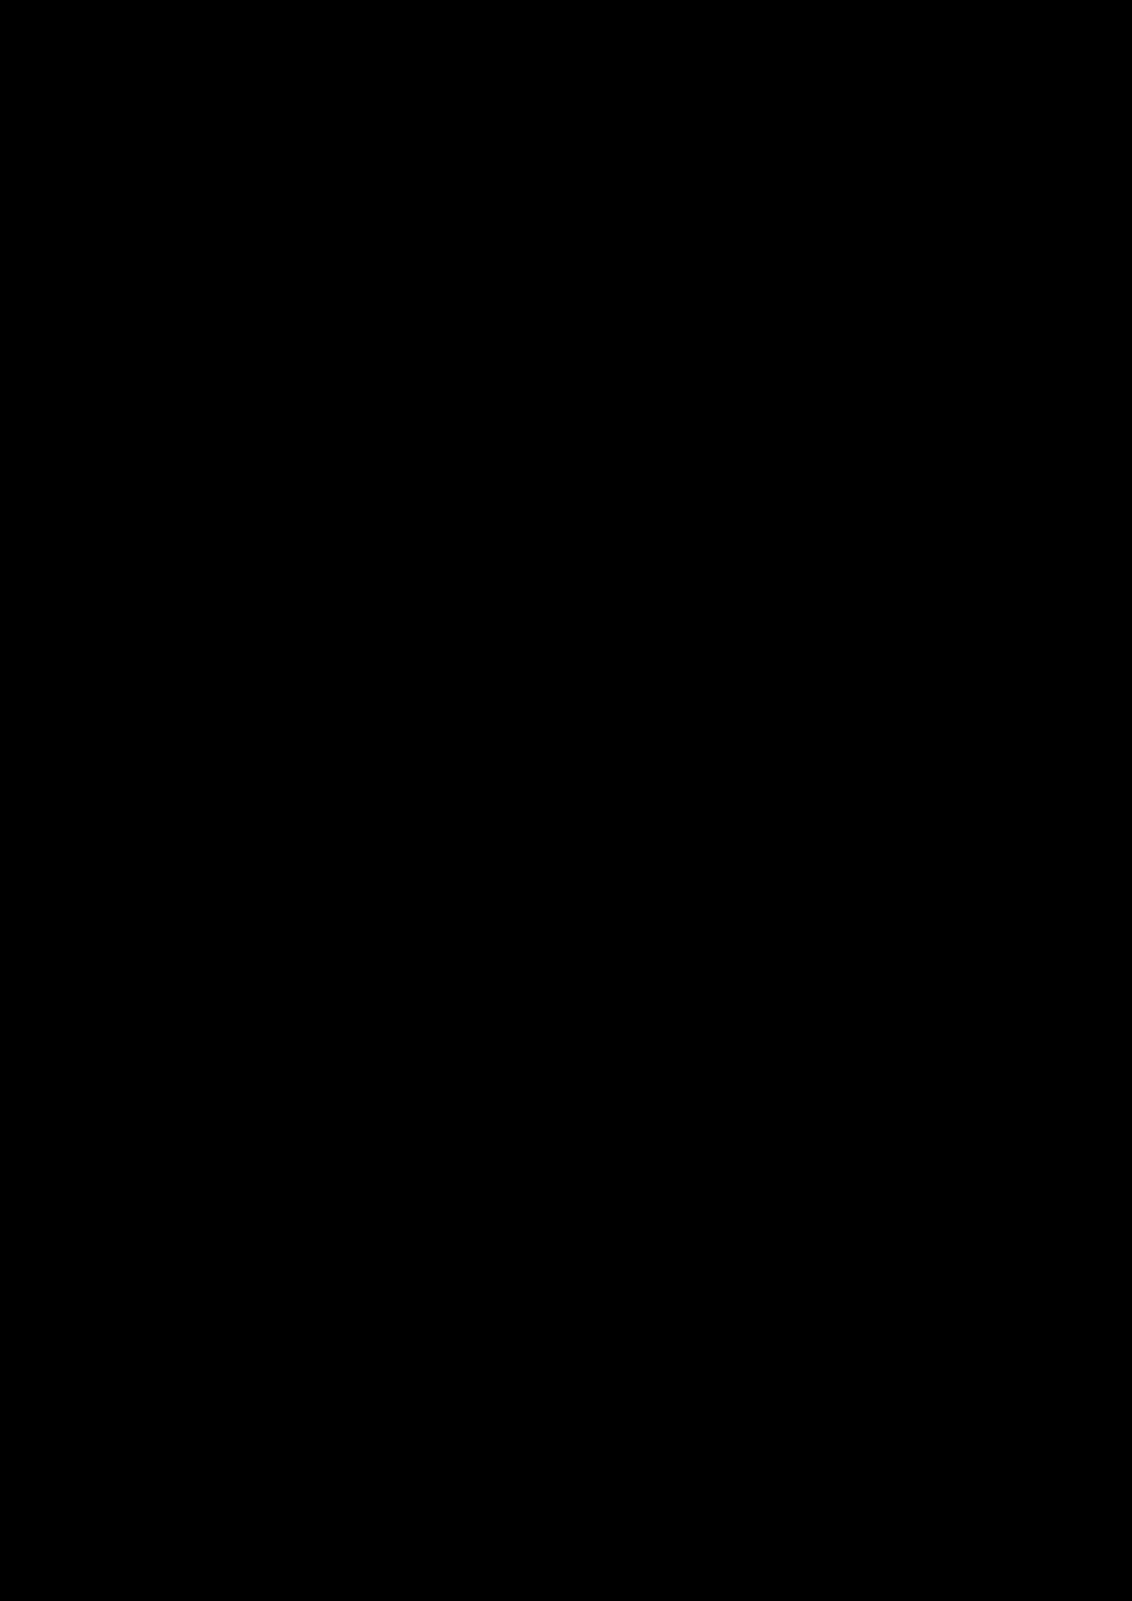 Ispoved Pervogo Boga slide, Image 54